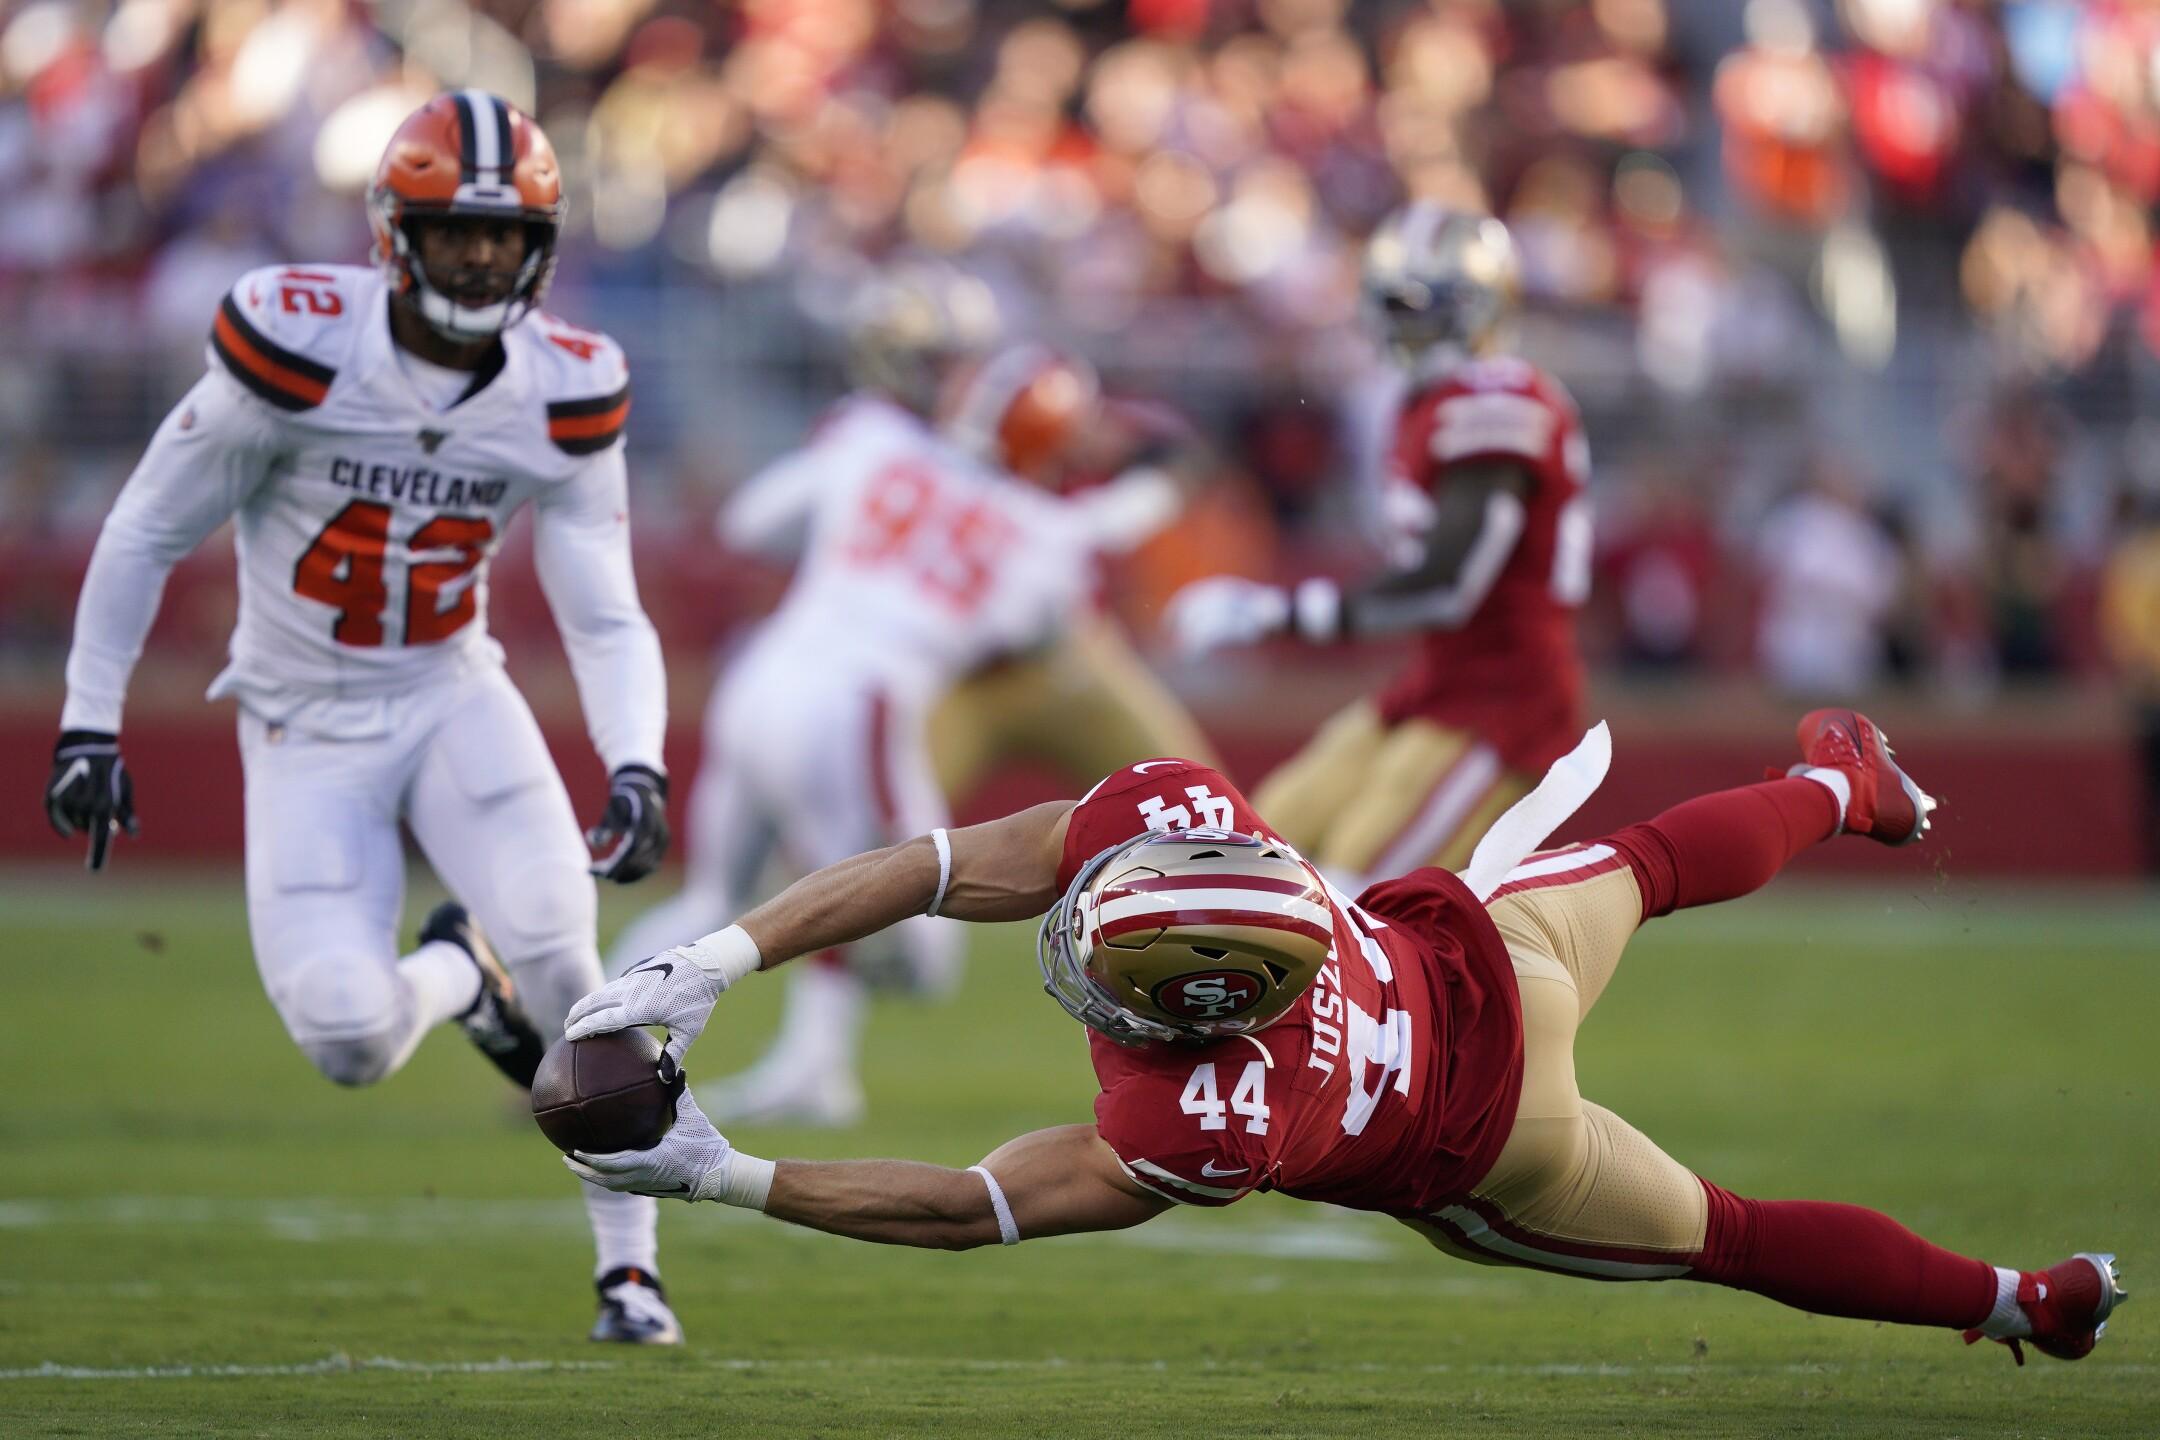 APTOPIX Browns 49ers Football